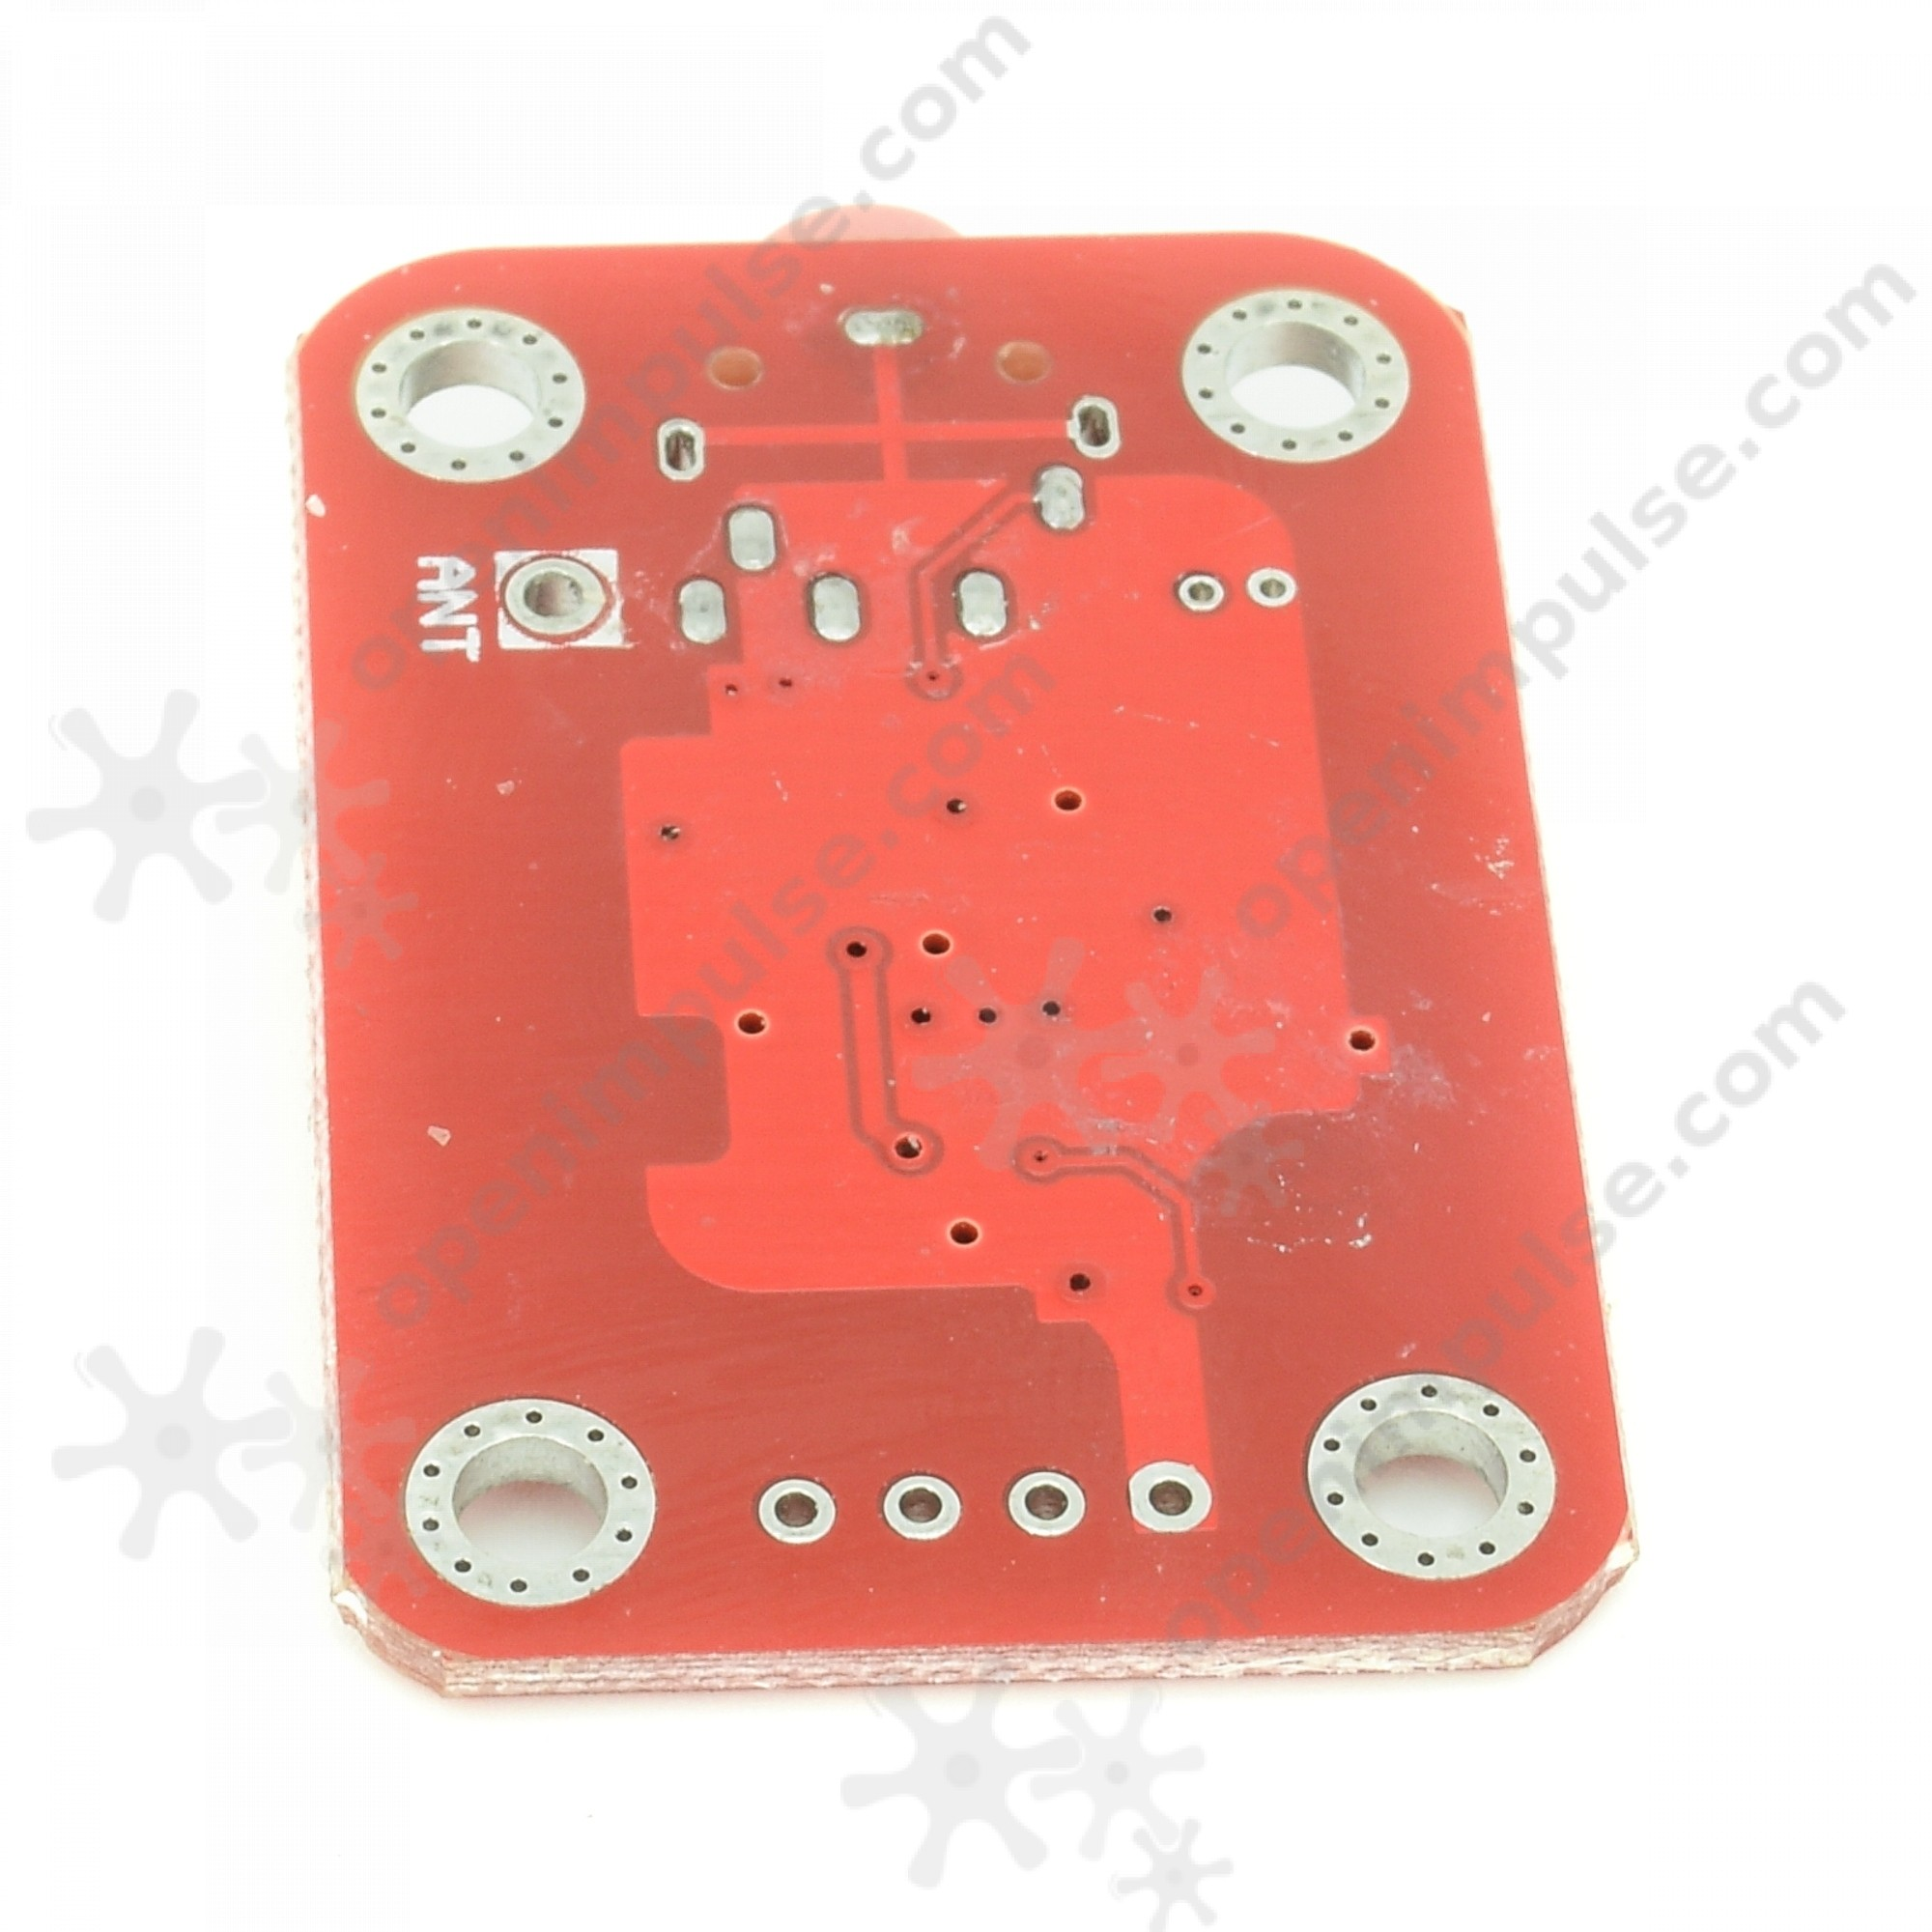 Fm Radio Transmitter Module Open Impulseopen Impulse Circuit User Prototype